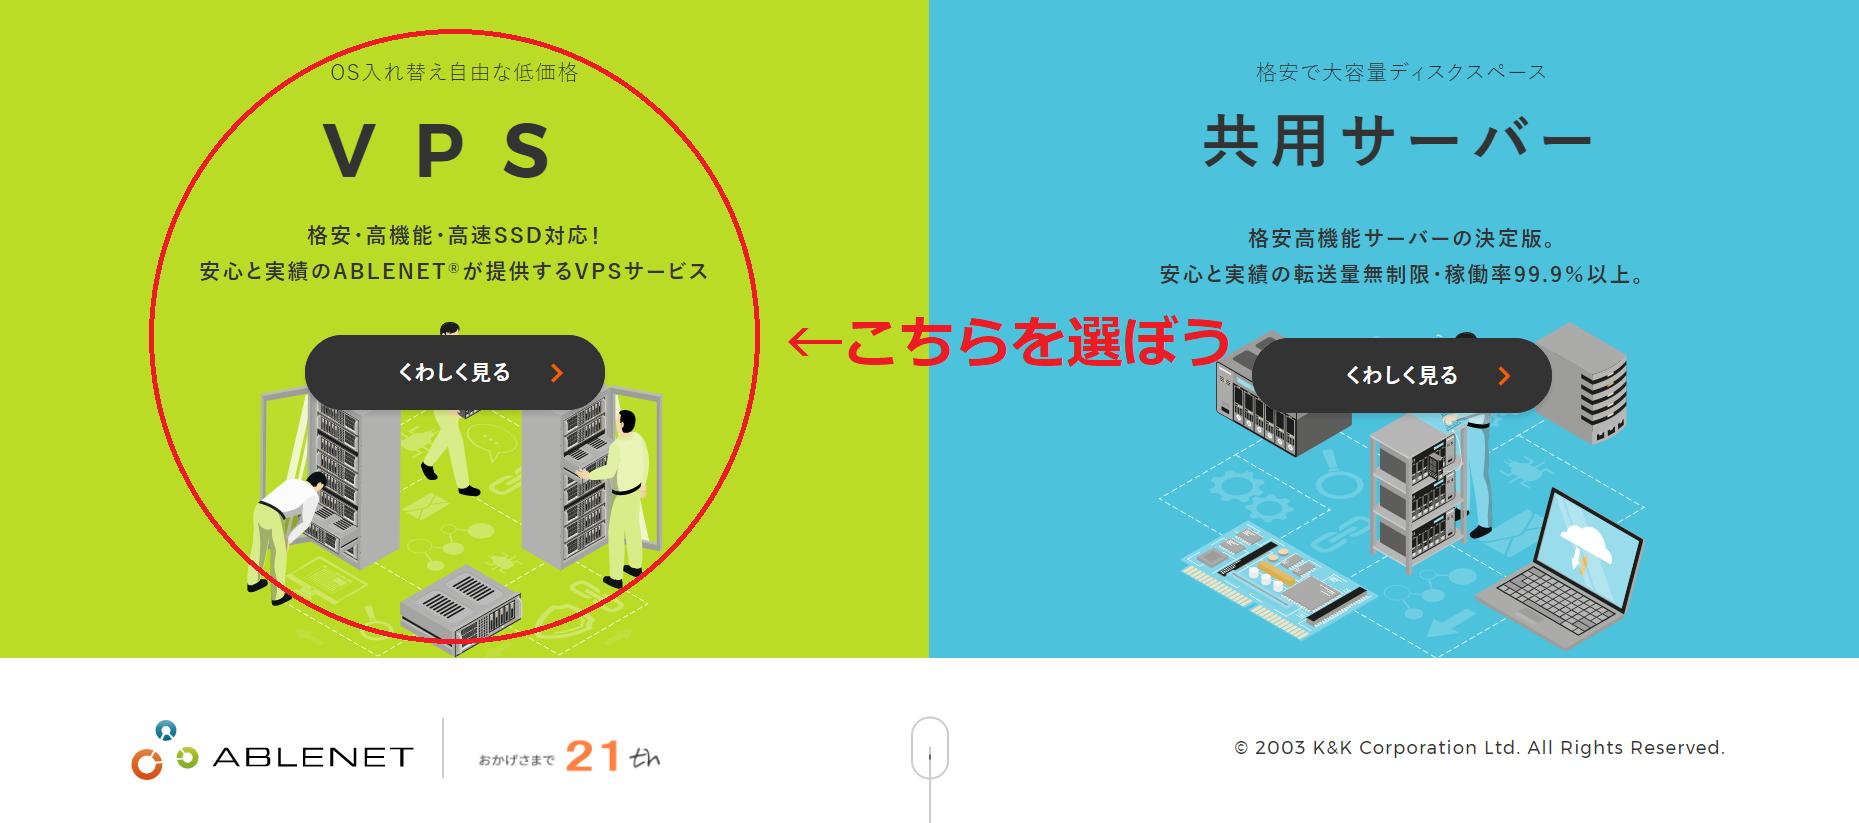 MT4でFX自動売買!格安VPSのABLENET(エイブルネット)